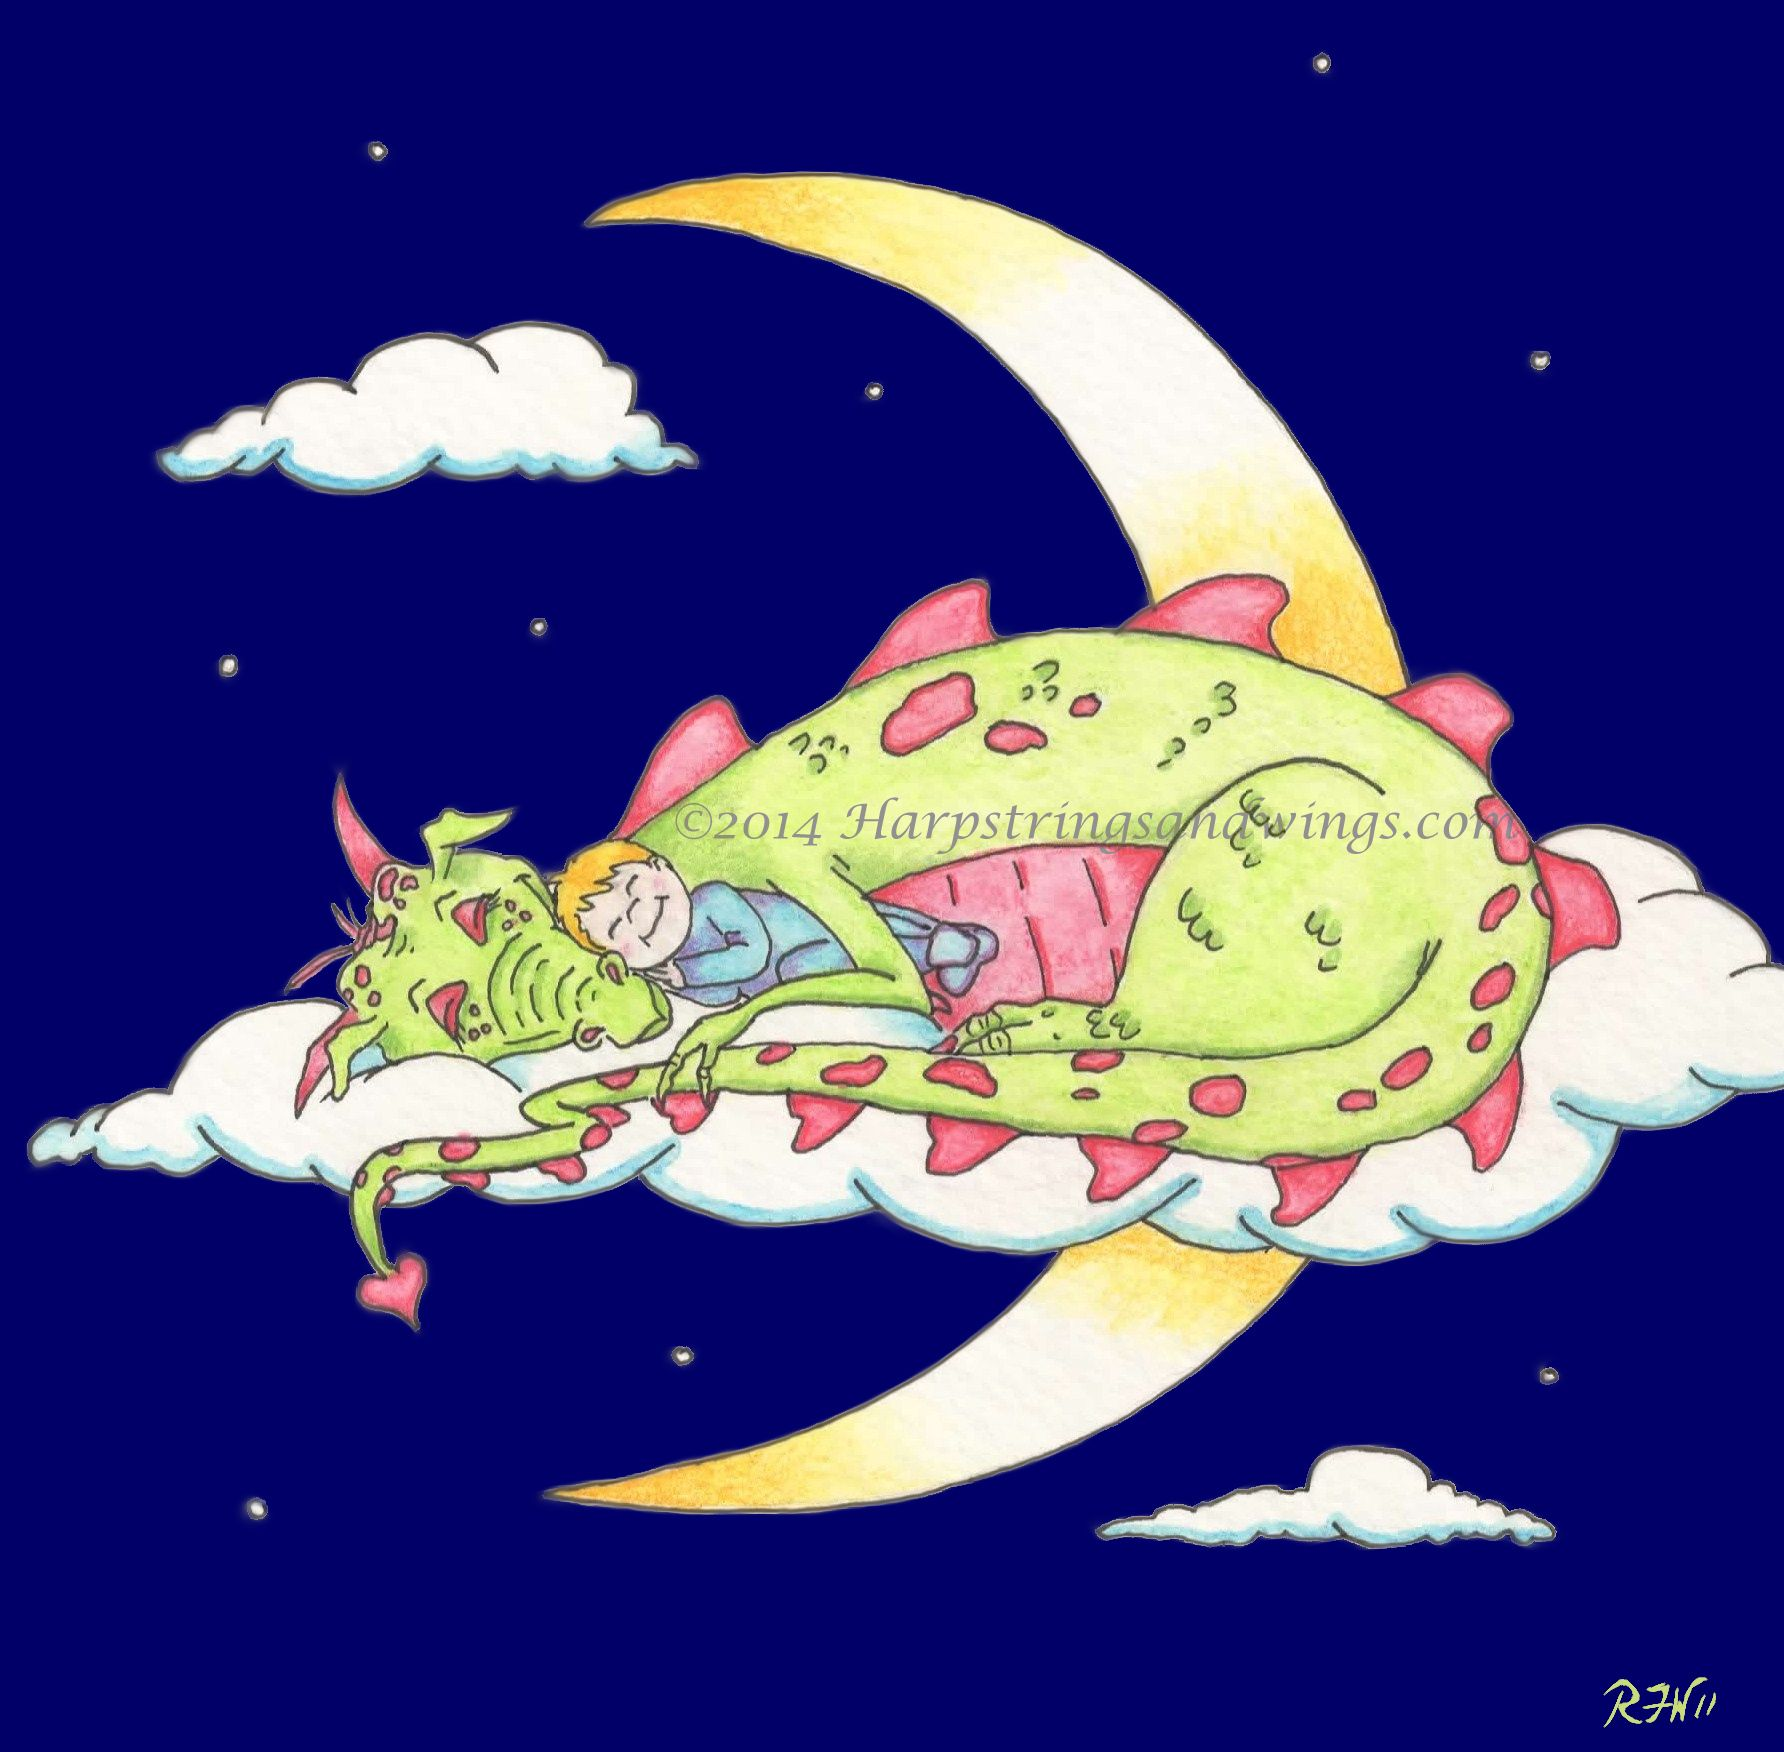 Sleeping Dragon - Colored Pencil/Digital Art (Children's Book Illustration)